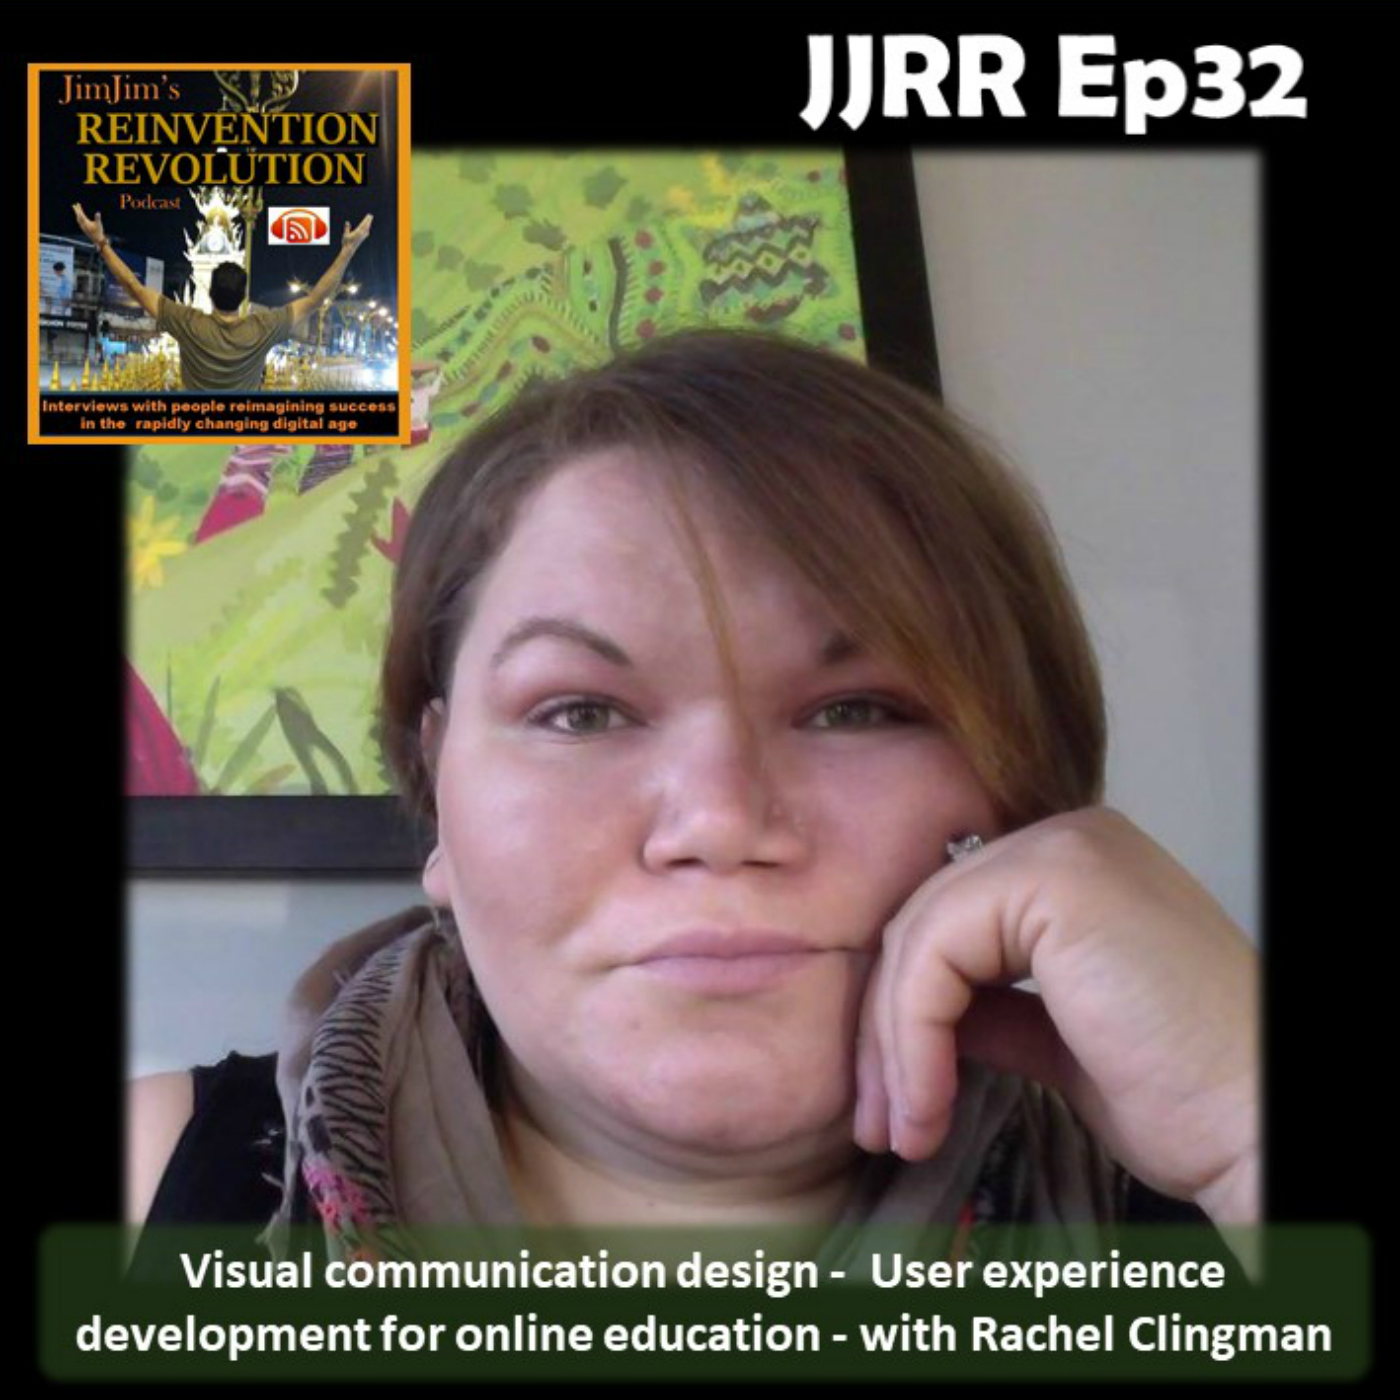 JJRR Ep32 Visual communication design – User experience development for online education – with Rachel Clingman